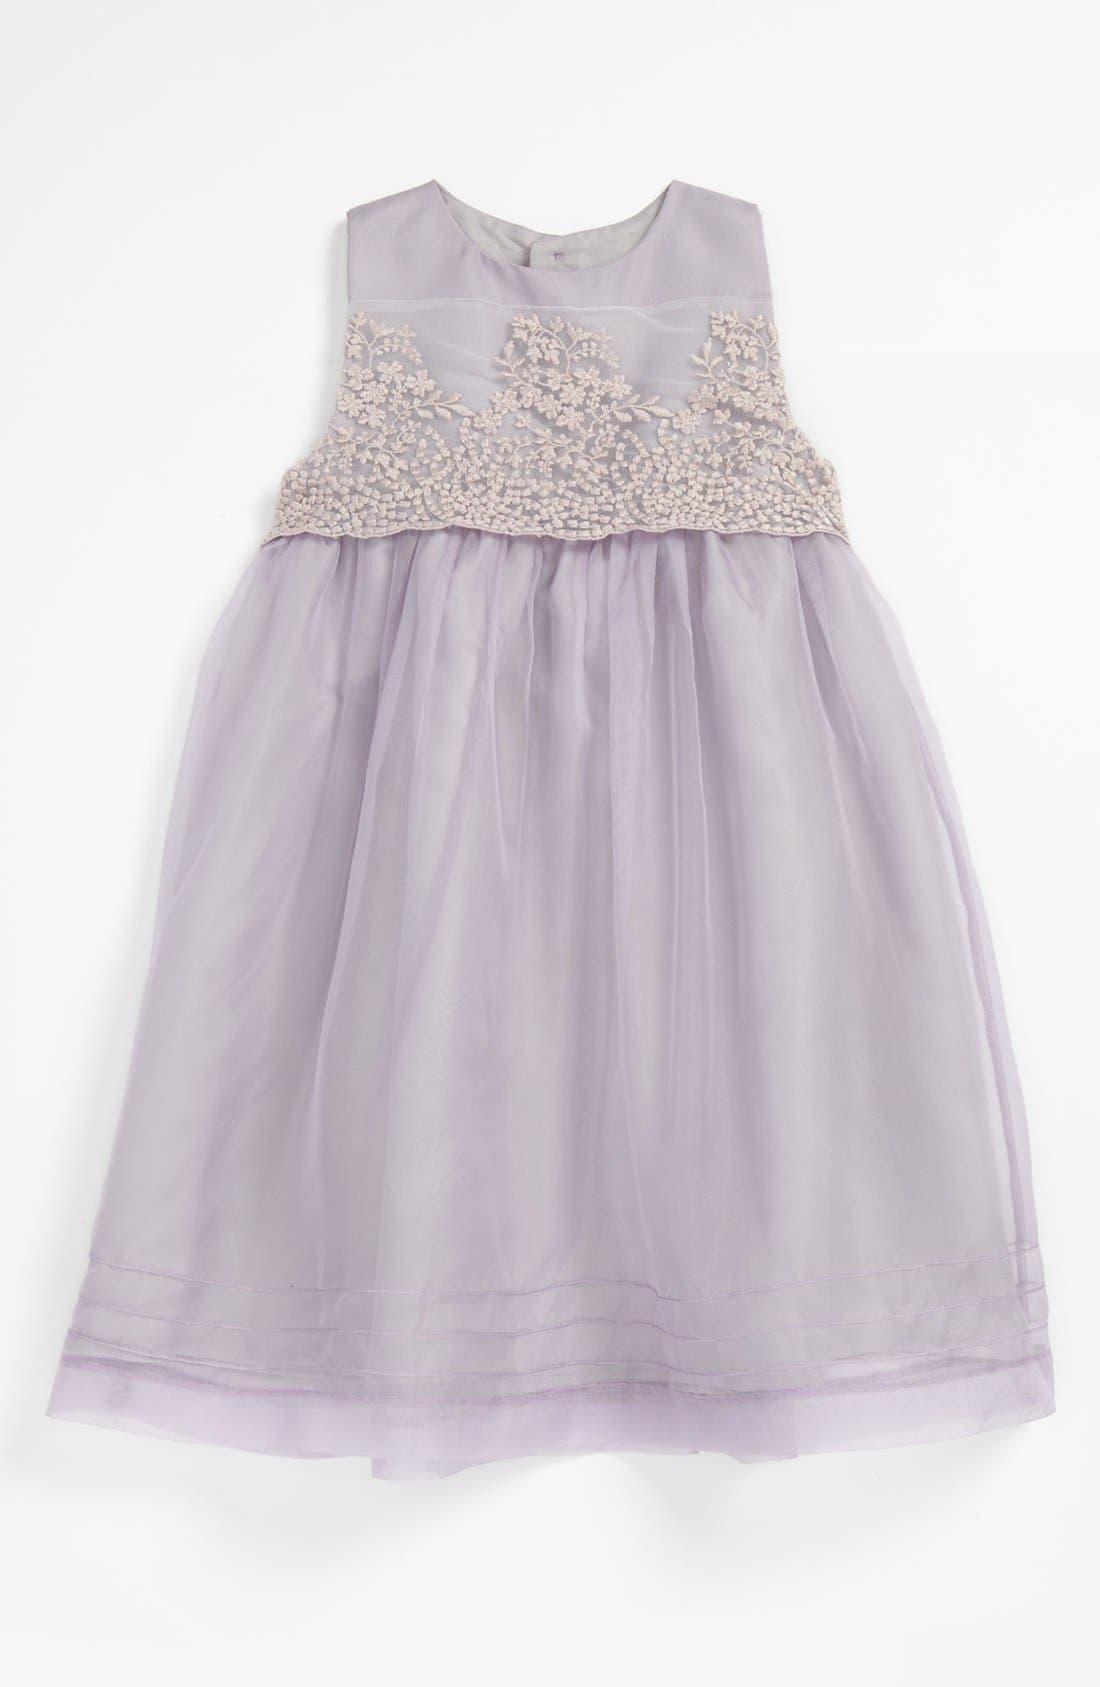 Alternate Image 1 Selected - Luli & Me Organza Dress (Baby)